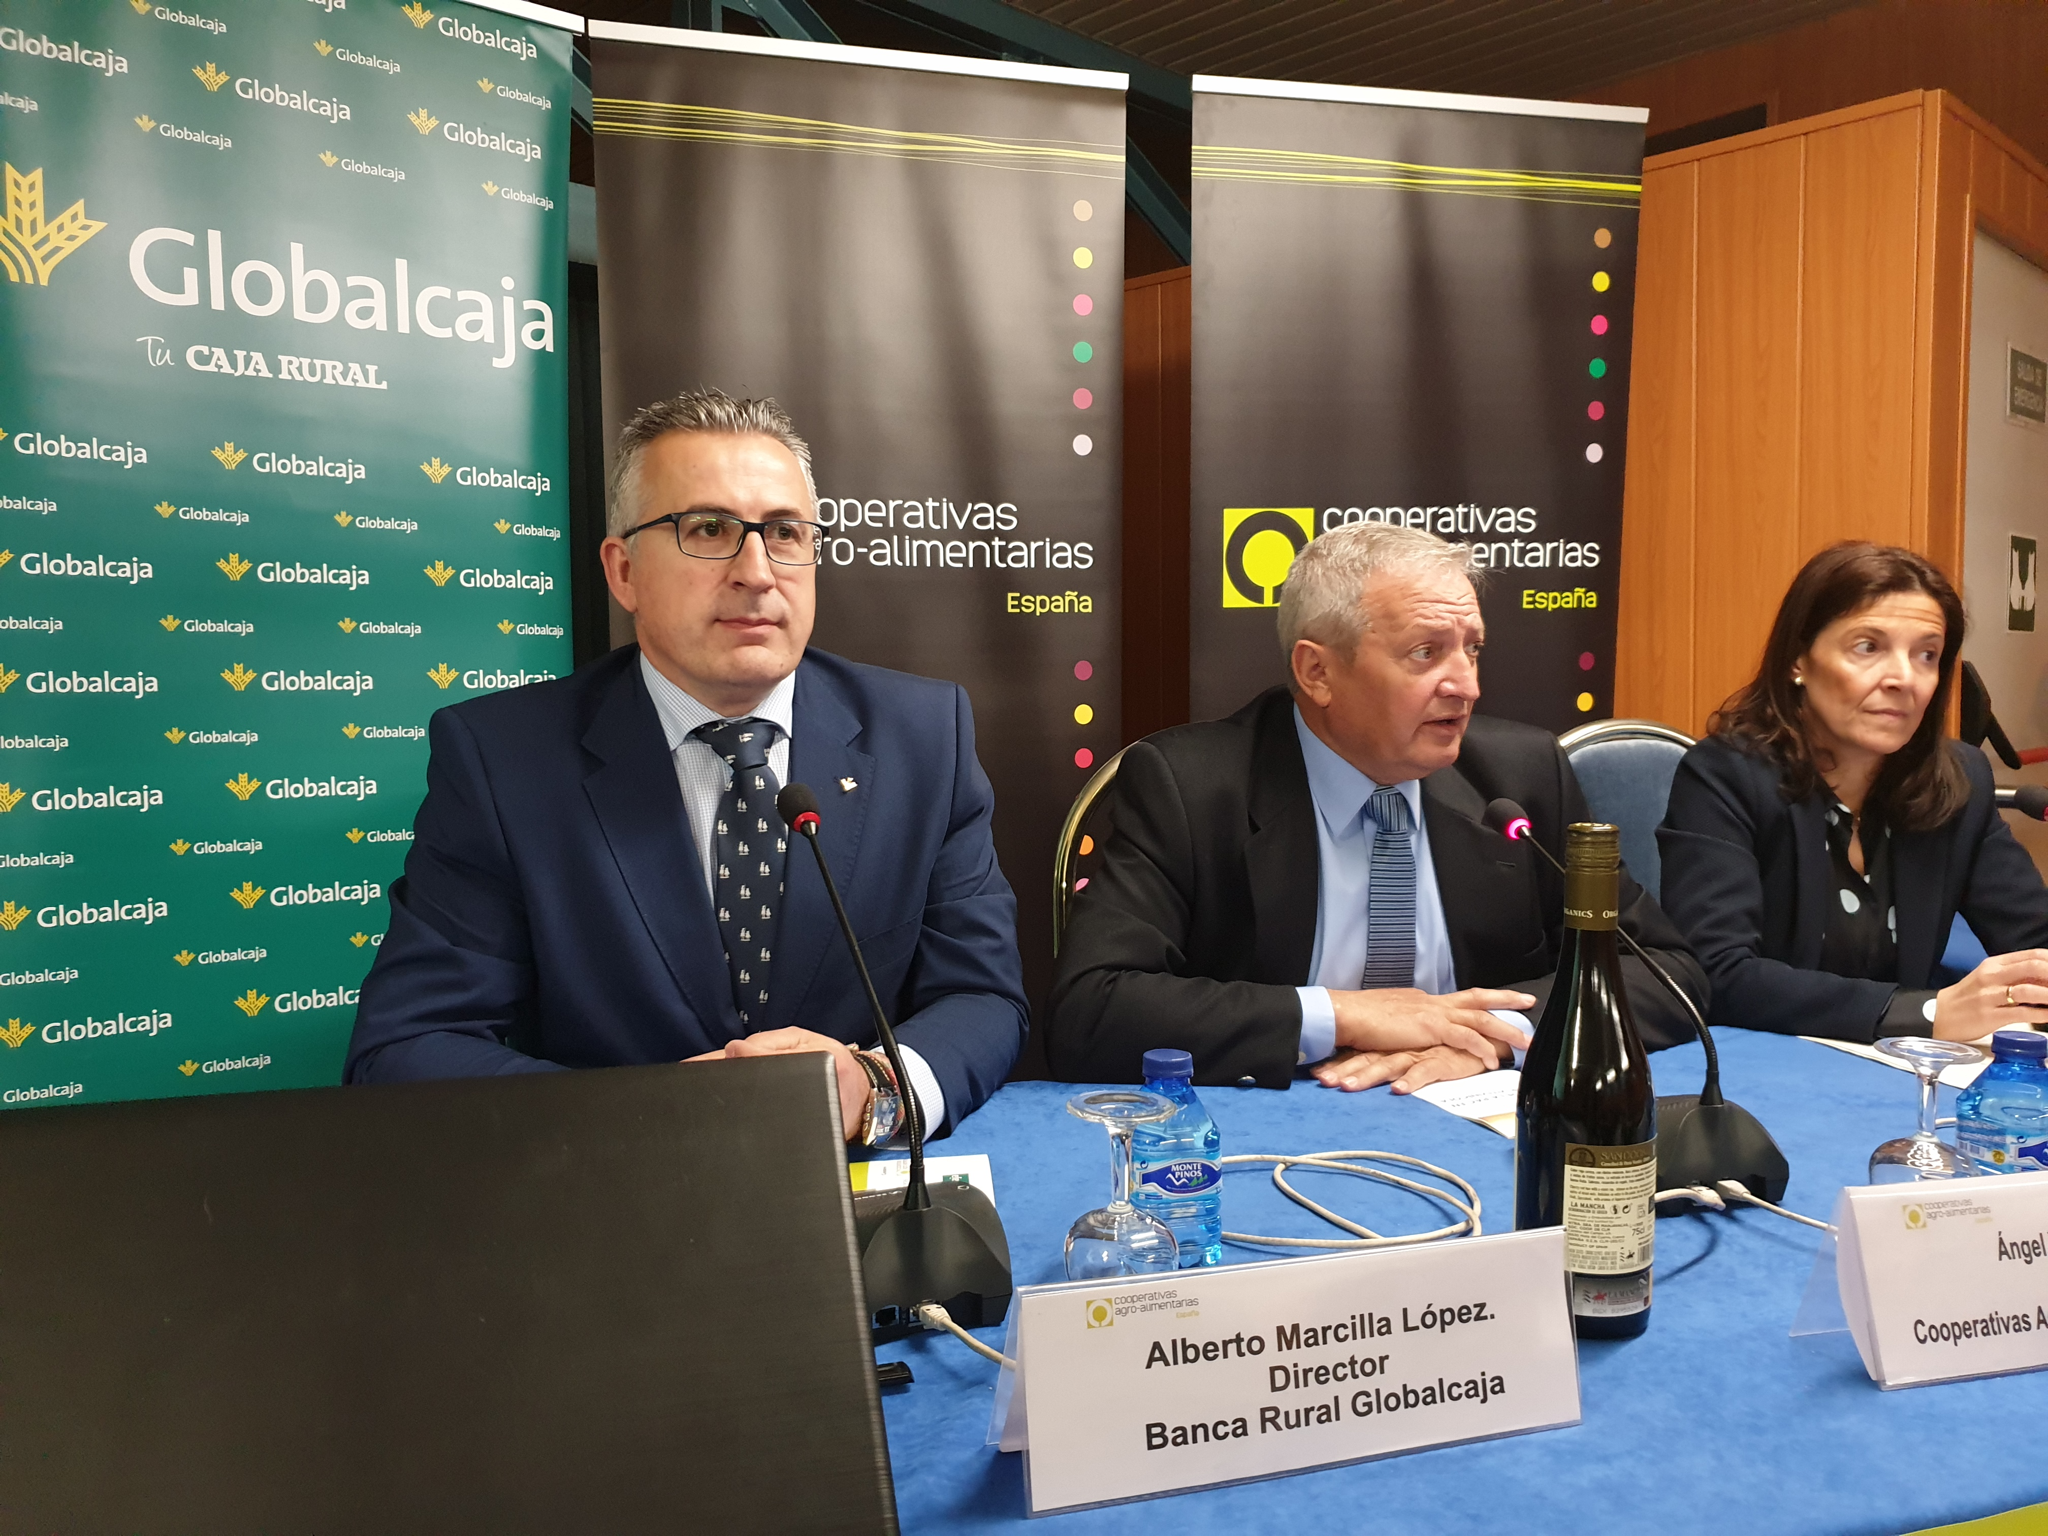 https://blog.globalcaja.es/wp-content/uploads/2020/02/Reforma-Pac.jpg